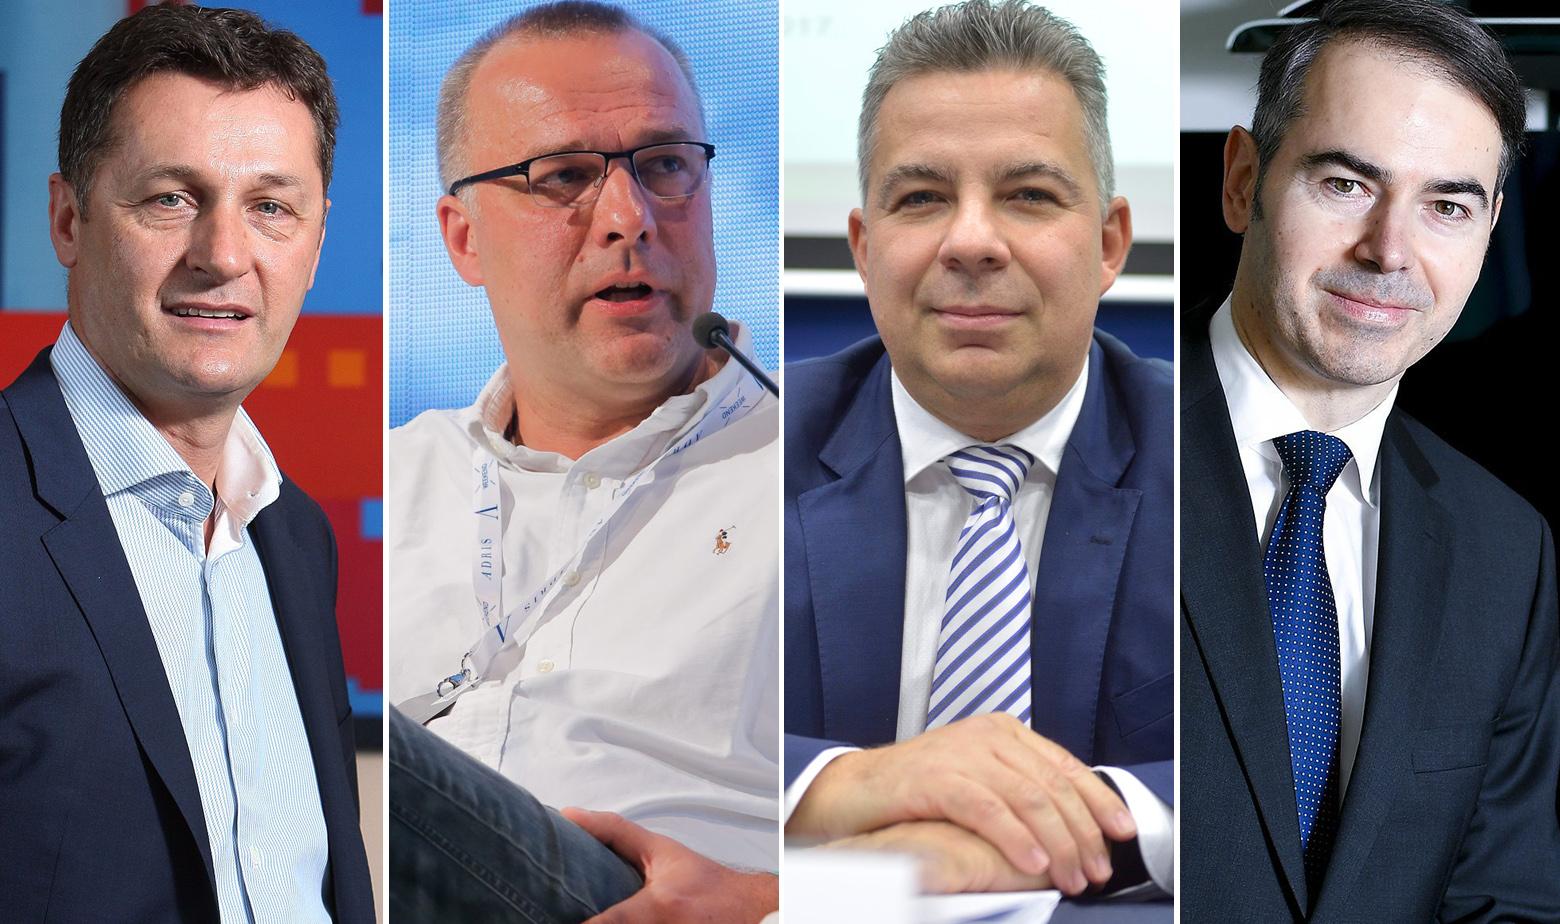 Jasminko Herceg, Davor Tomašković, Zoltan Aldot, Dinko Lucić